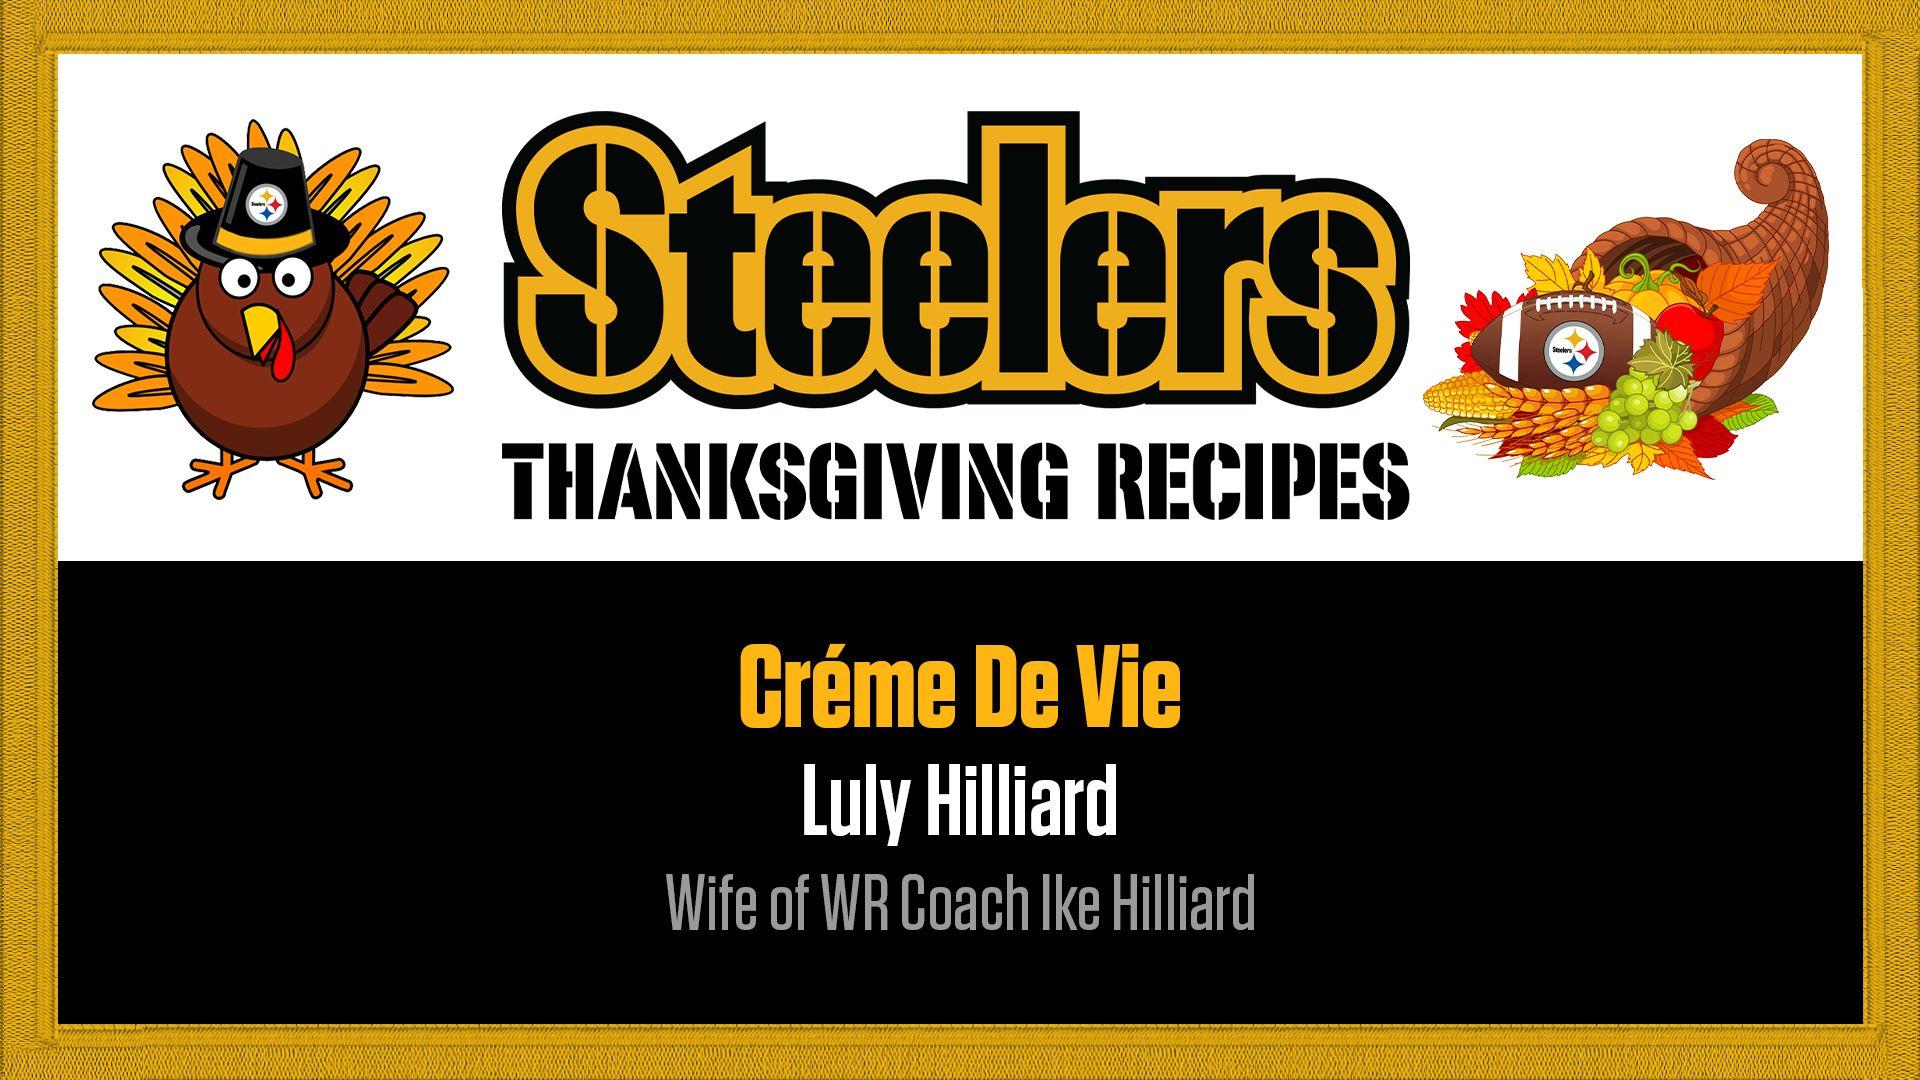 Recipe - creme de vie_luly hilliard